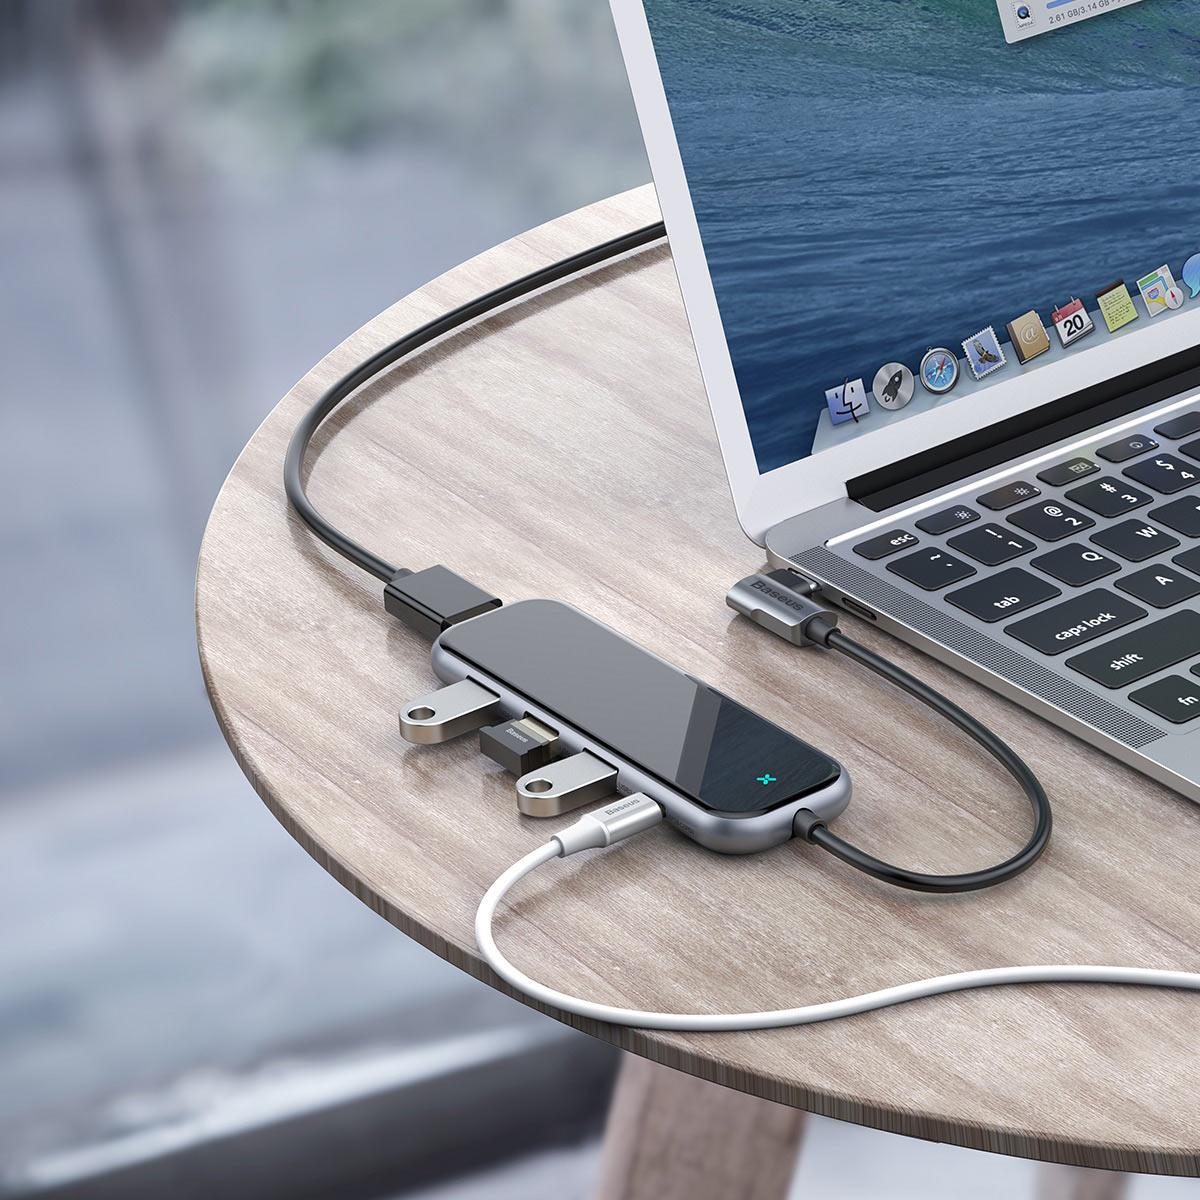 Hub Baseus Multi-Funcional (Type-C to 3x USB 3.0 + 4K/HD+PD) Adapter for Macbook/PC